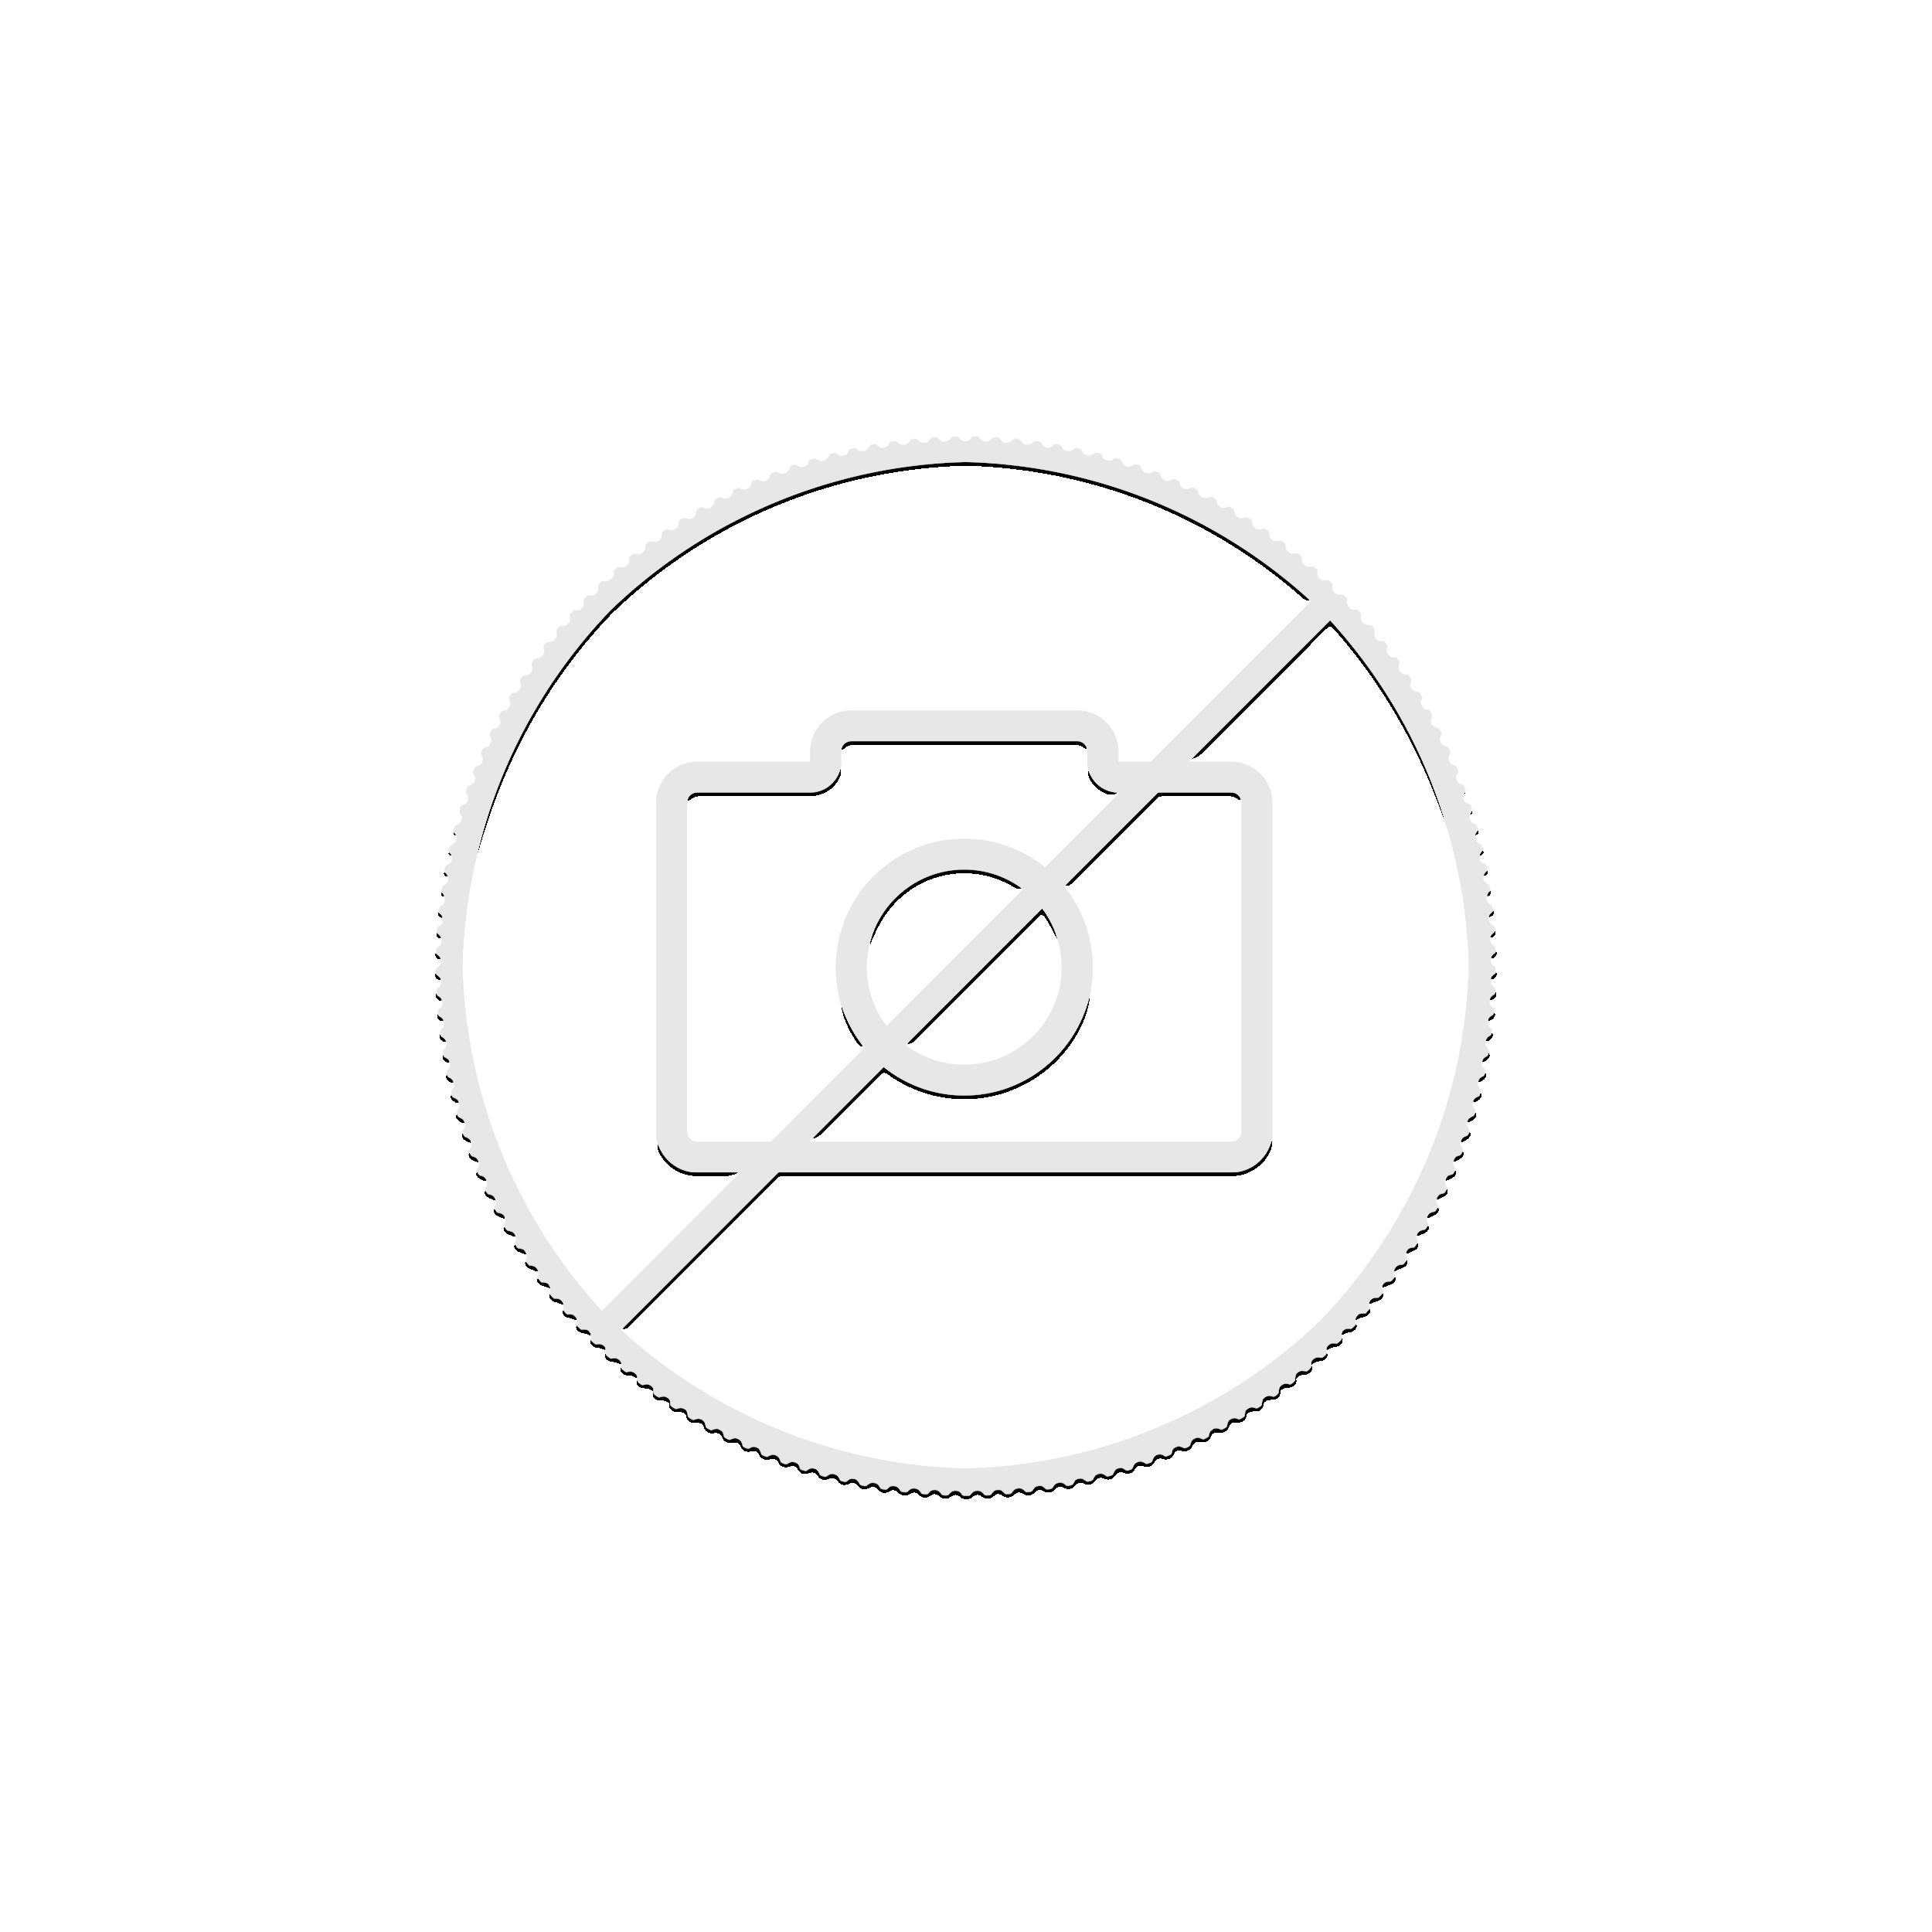 1 Troy ounce golden coin Lunar 2020 Proof